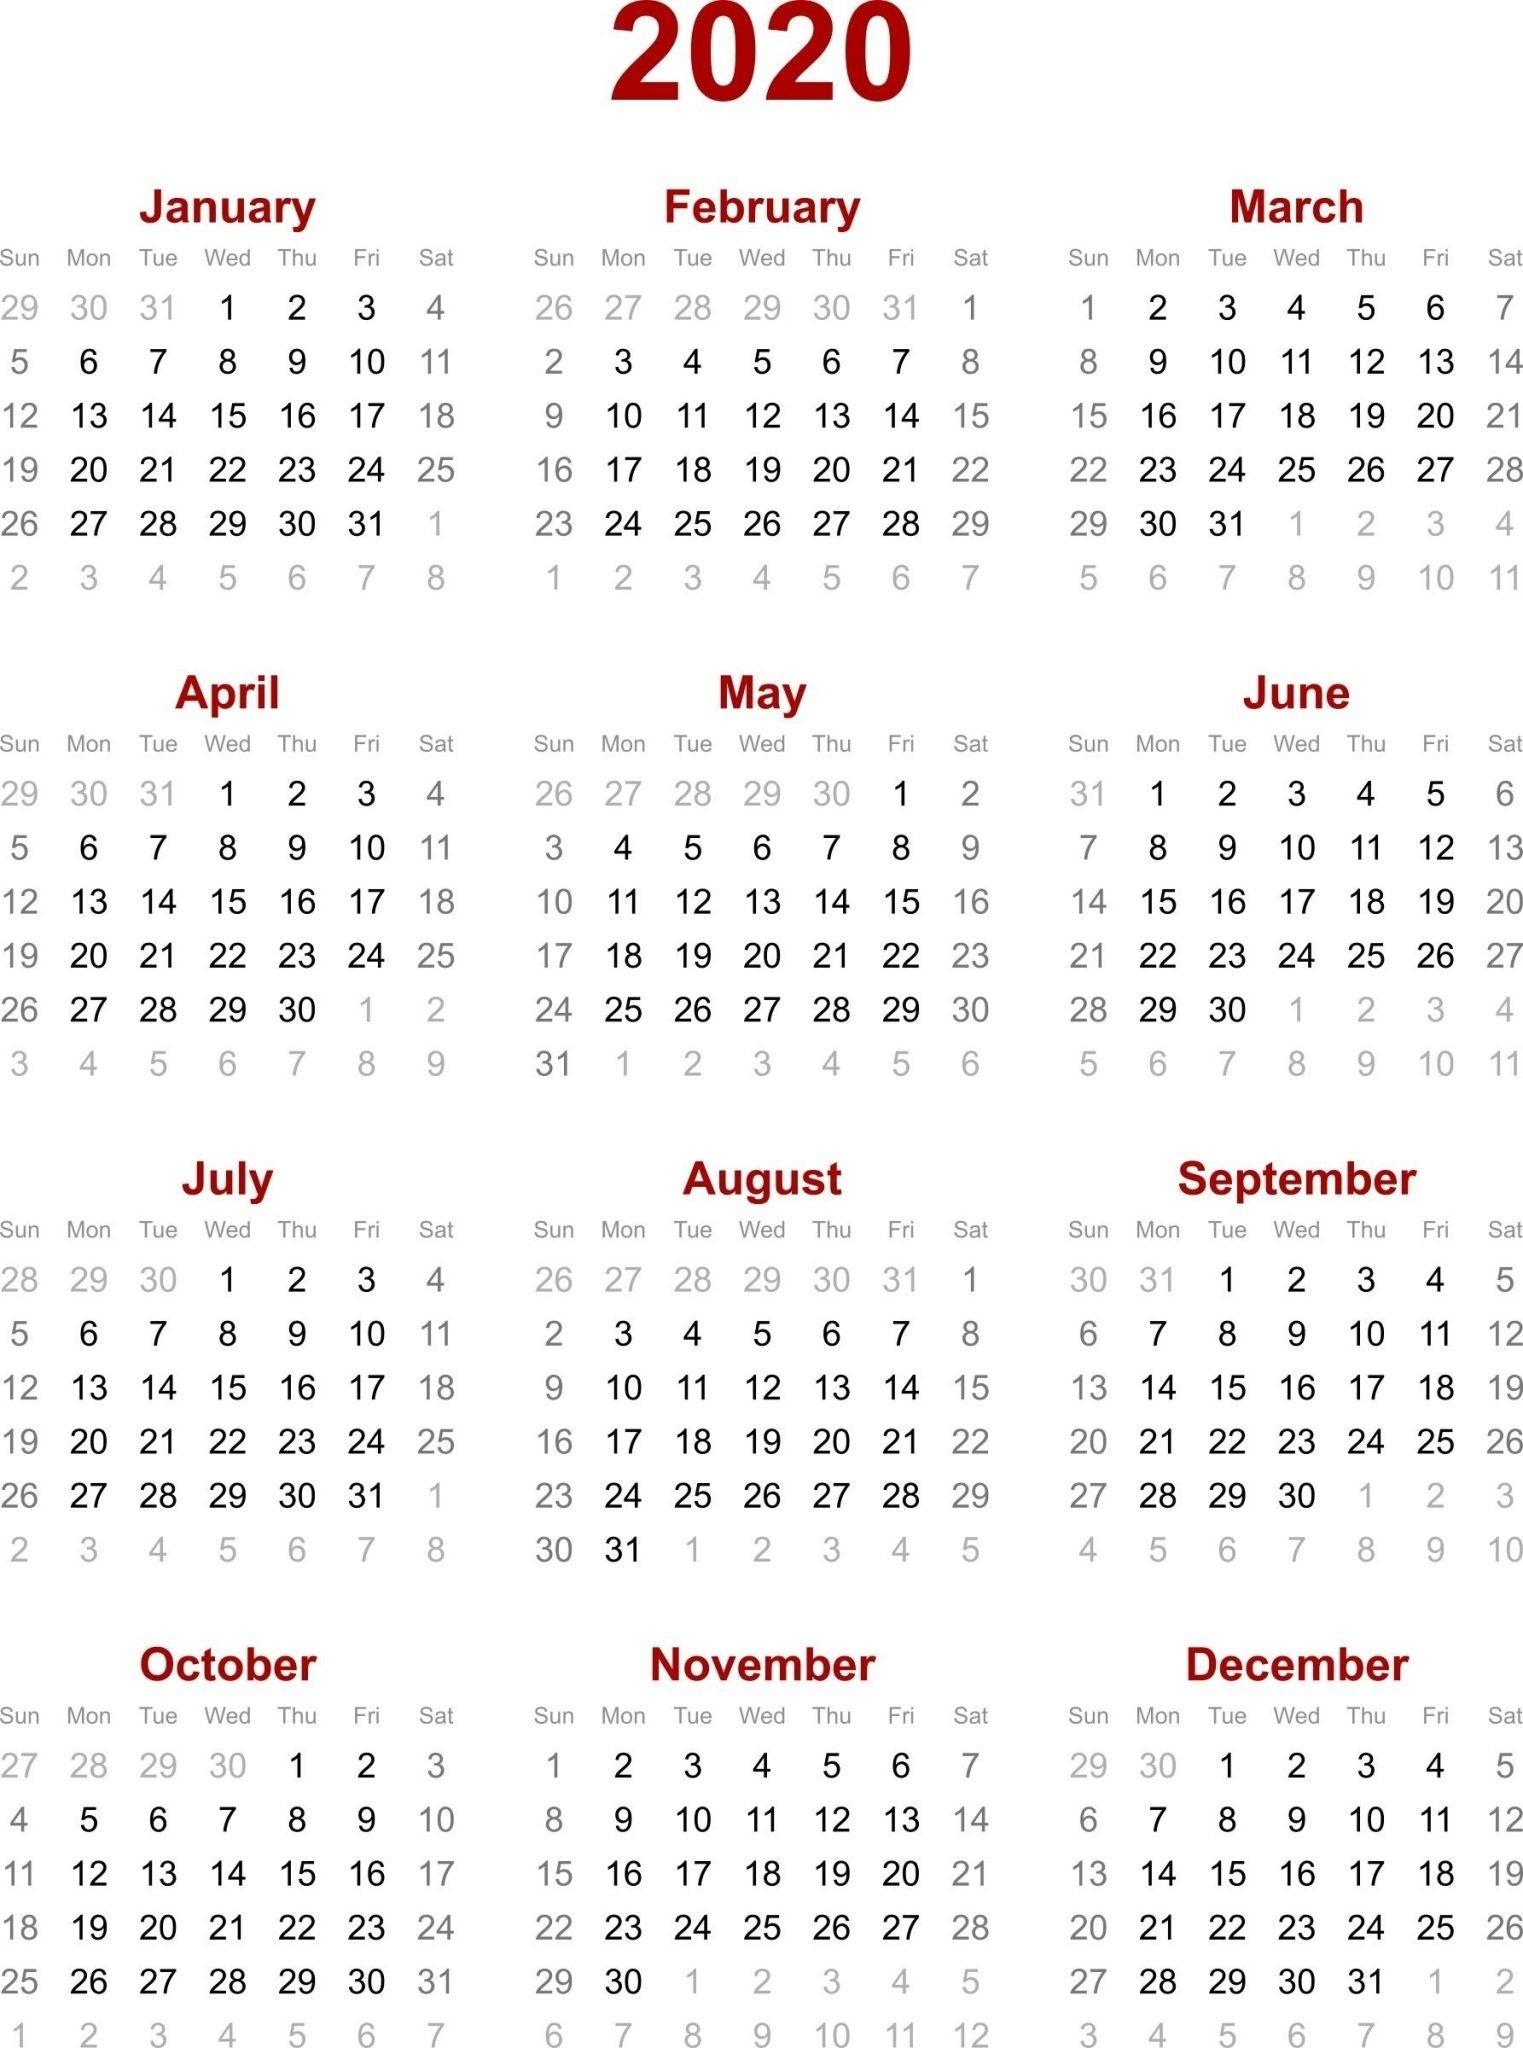 Chinese Calendar 2020 Printable Template | 2020 Calendar Impressive Printable Jewish Holiday Calendar 2020